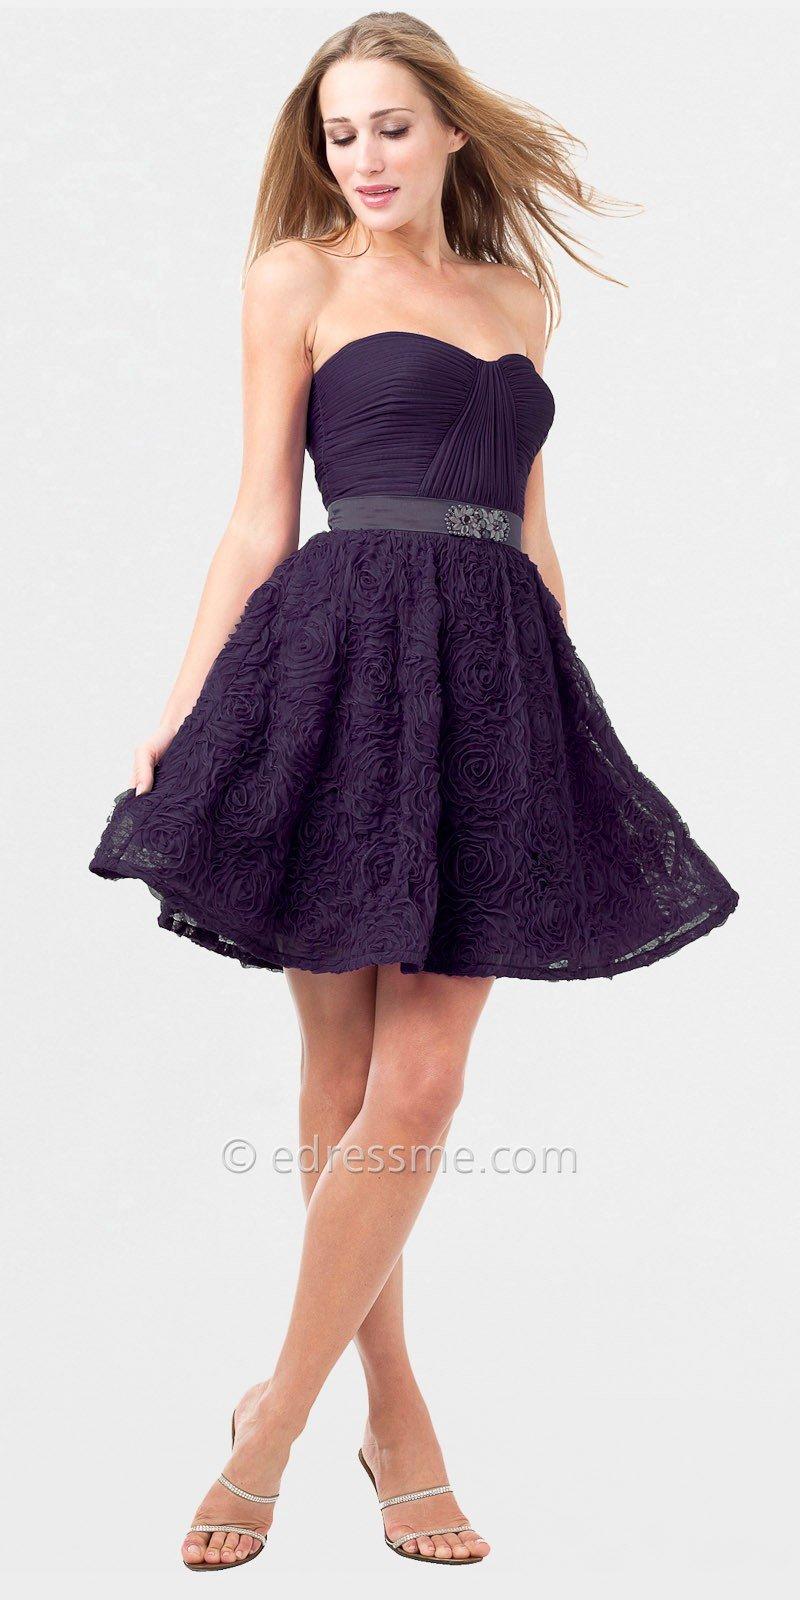 vestido roxo para festa